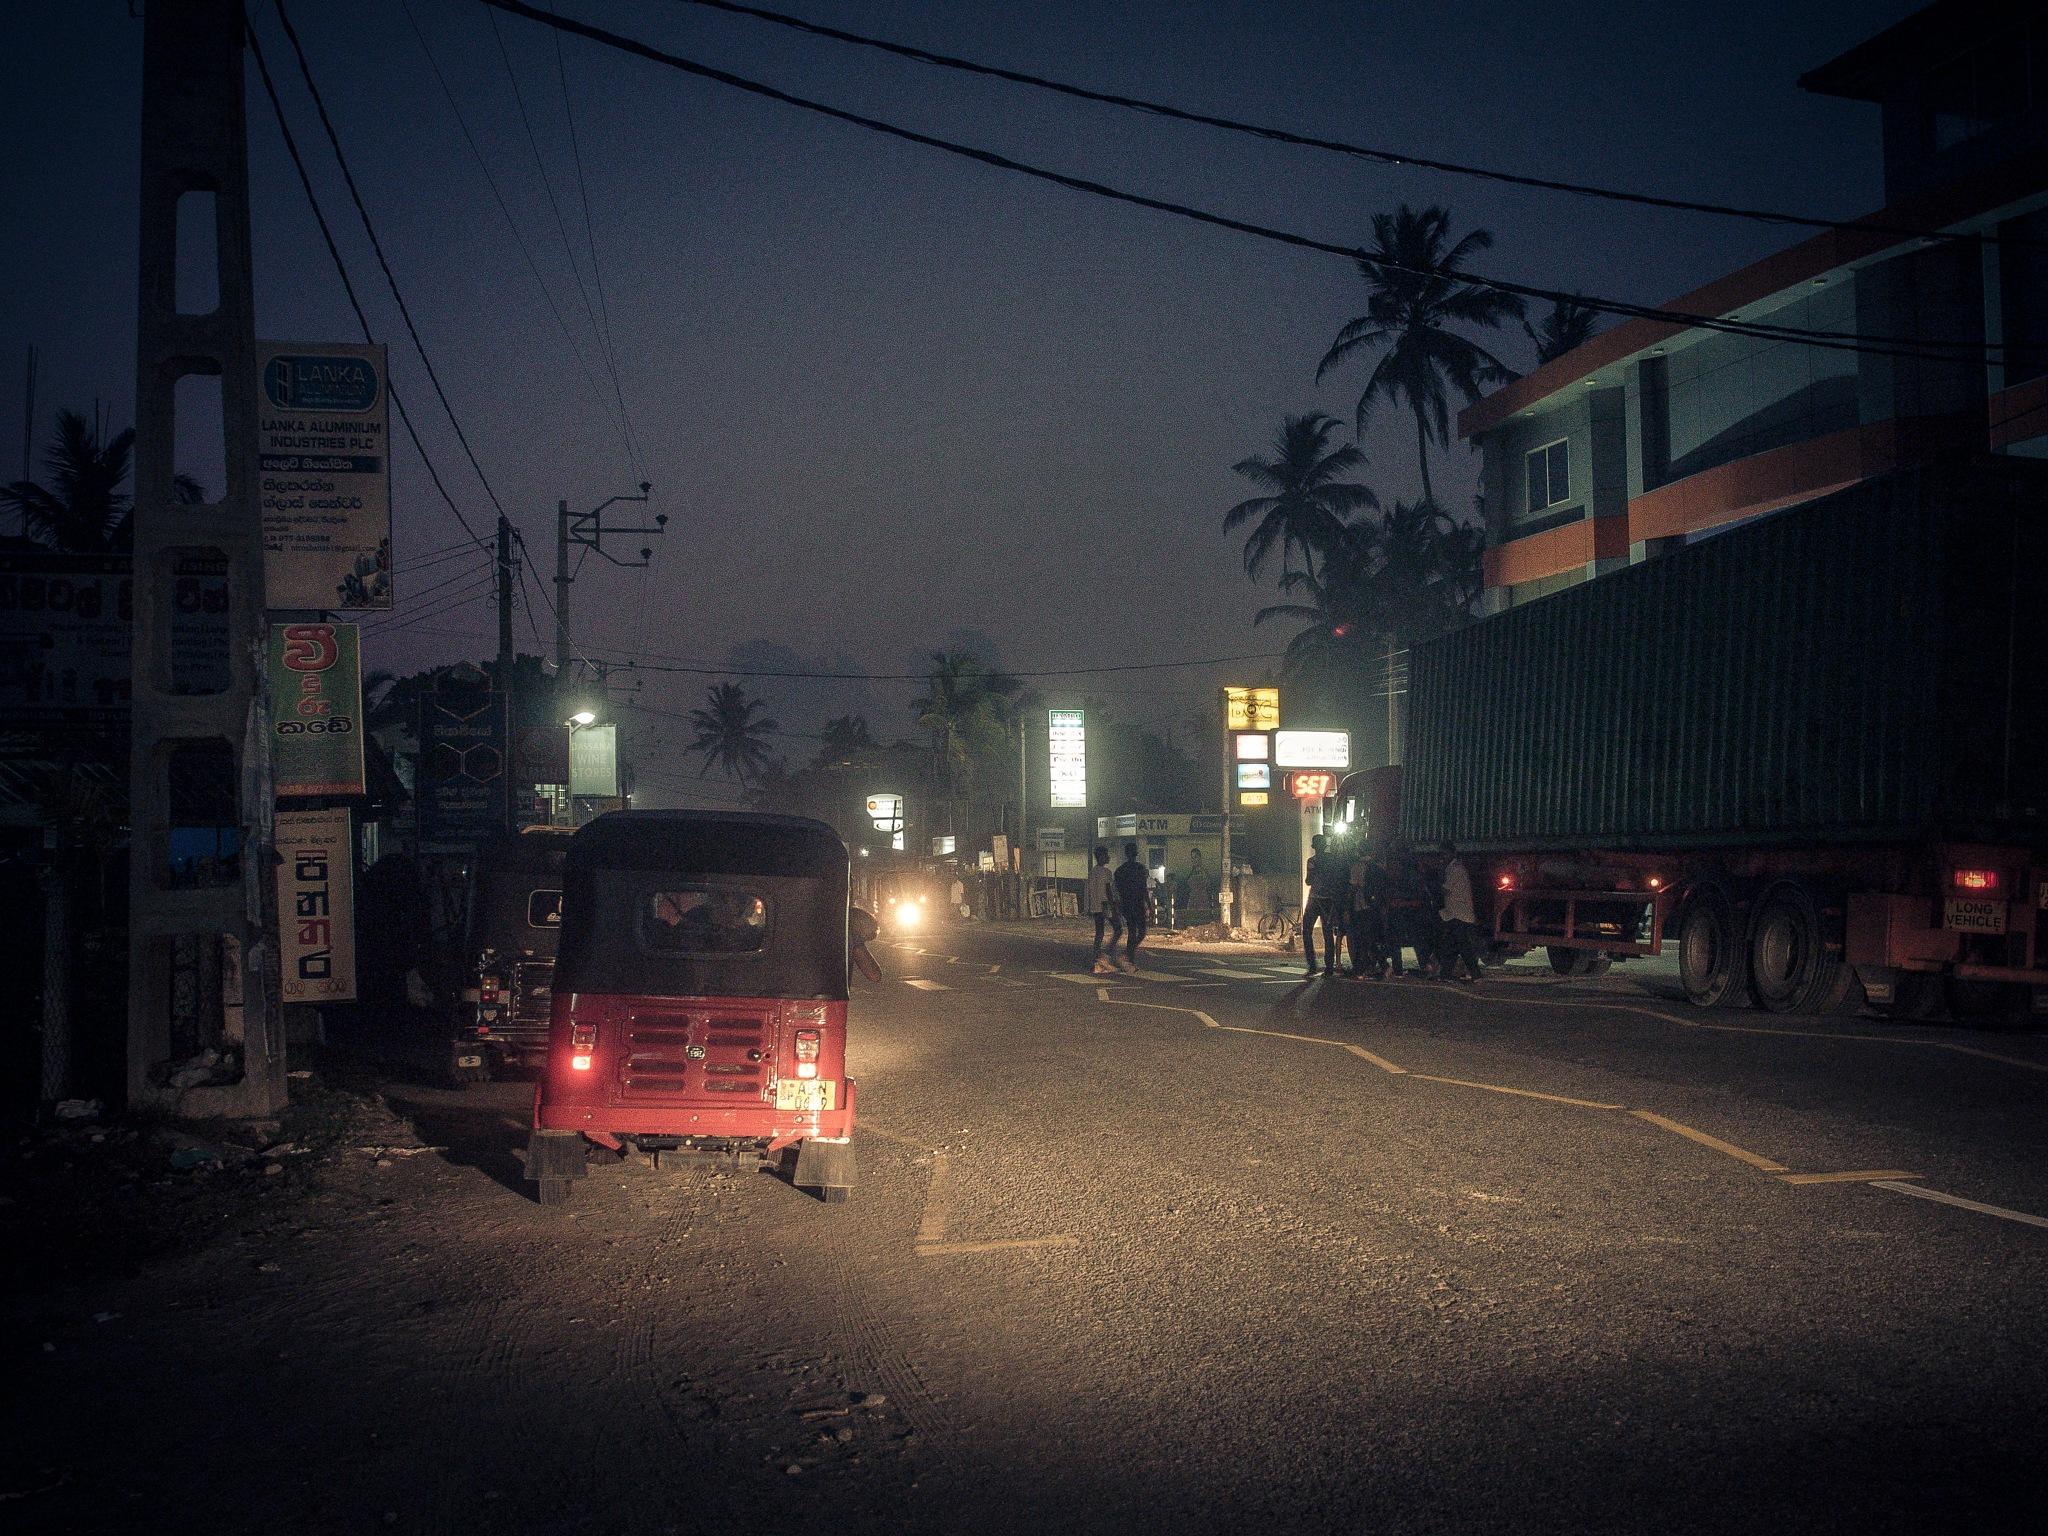 Night time I'm Sri Lanka by S photos on YouPic